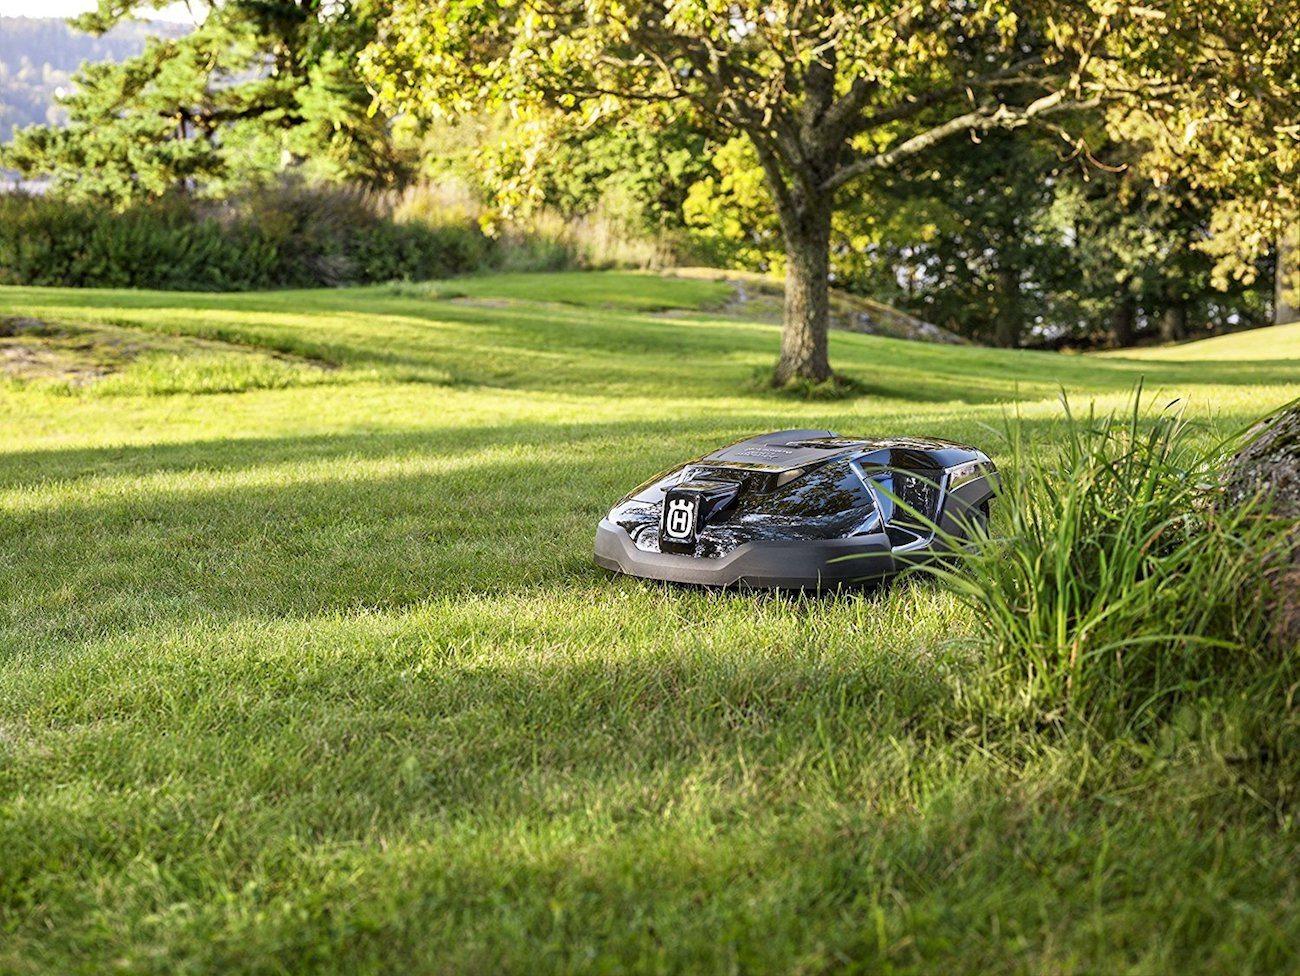 Husqvarna Automower 315 Robotic Lawn Mower